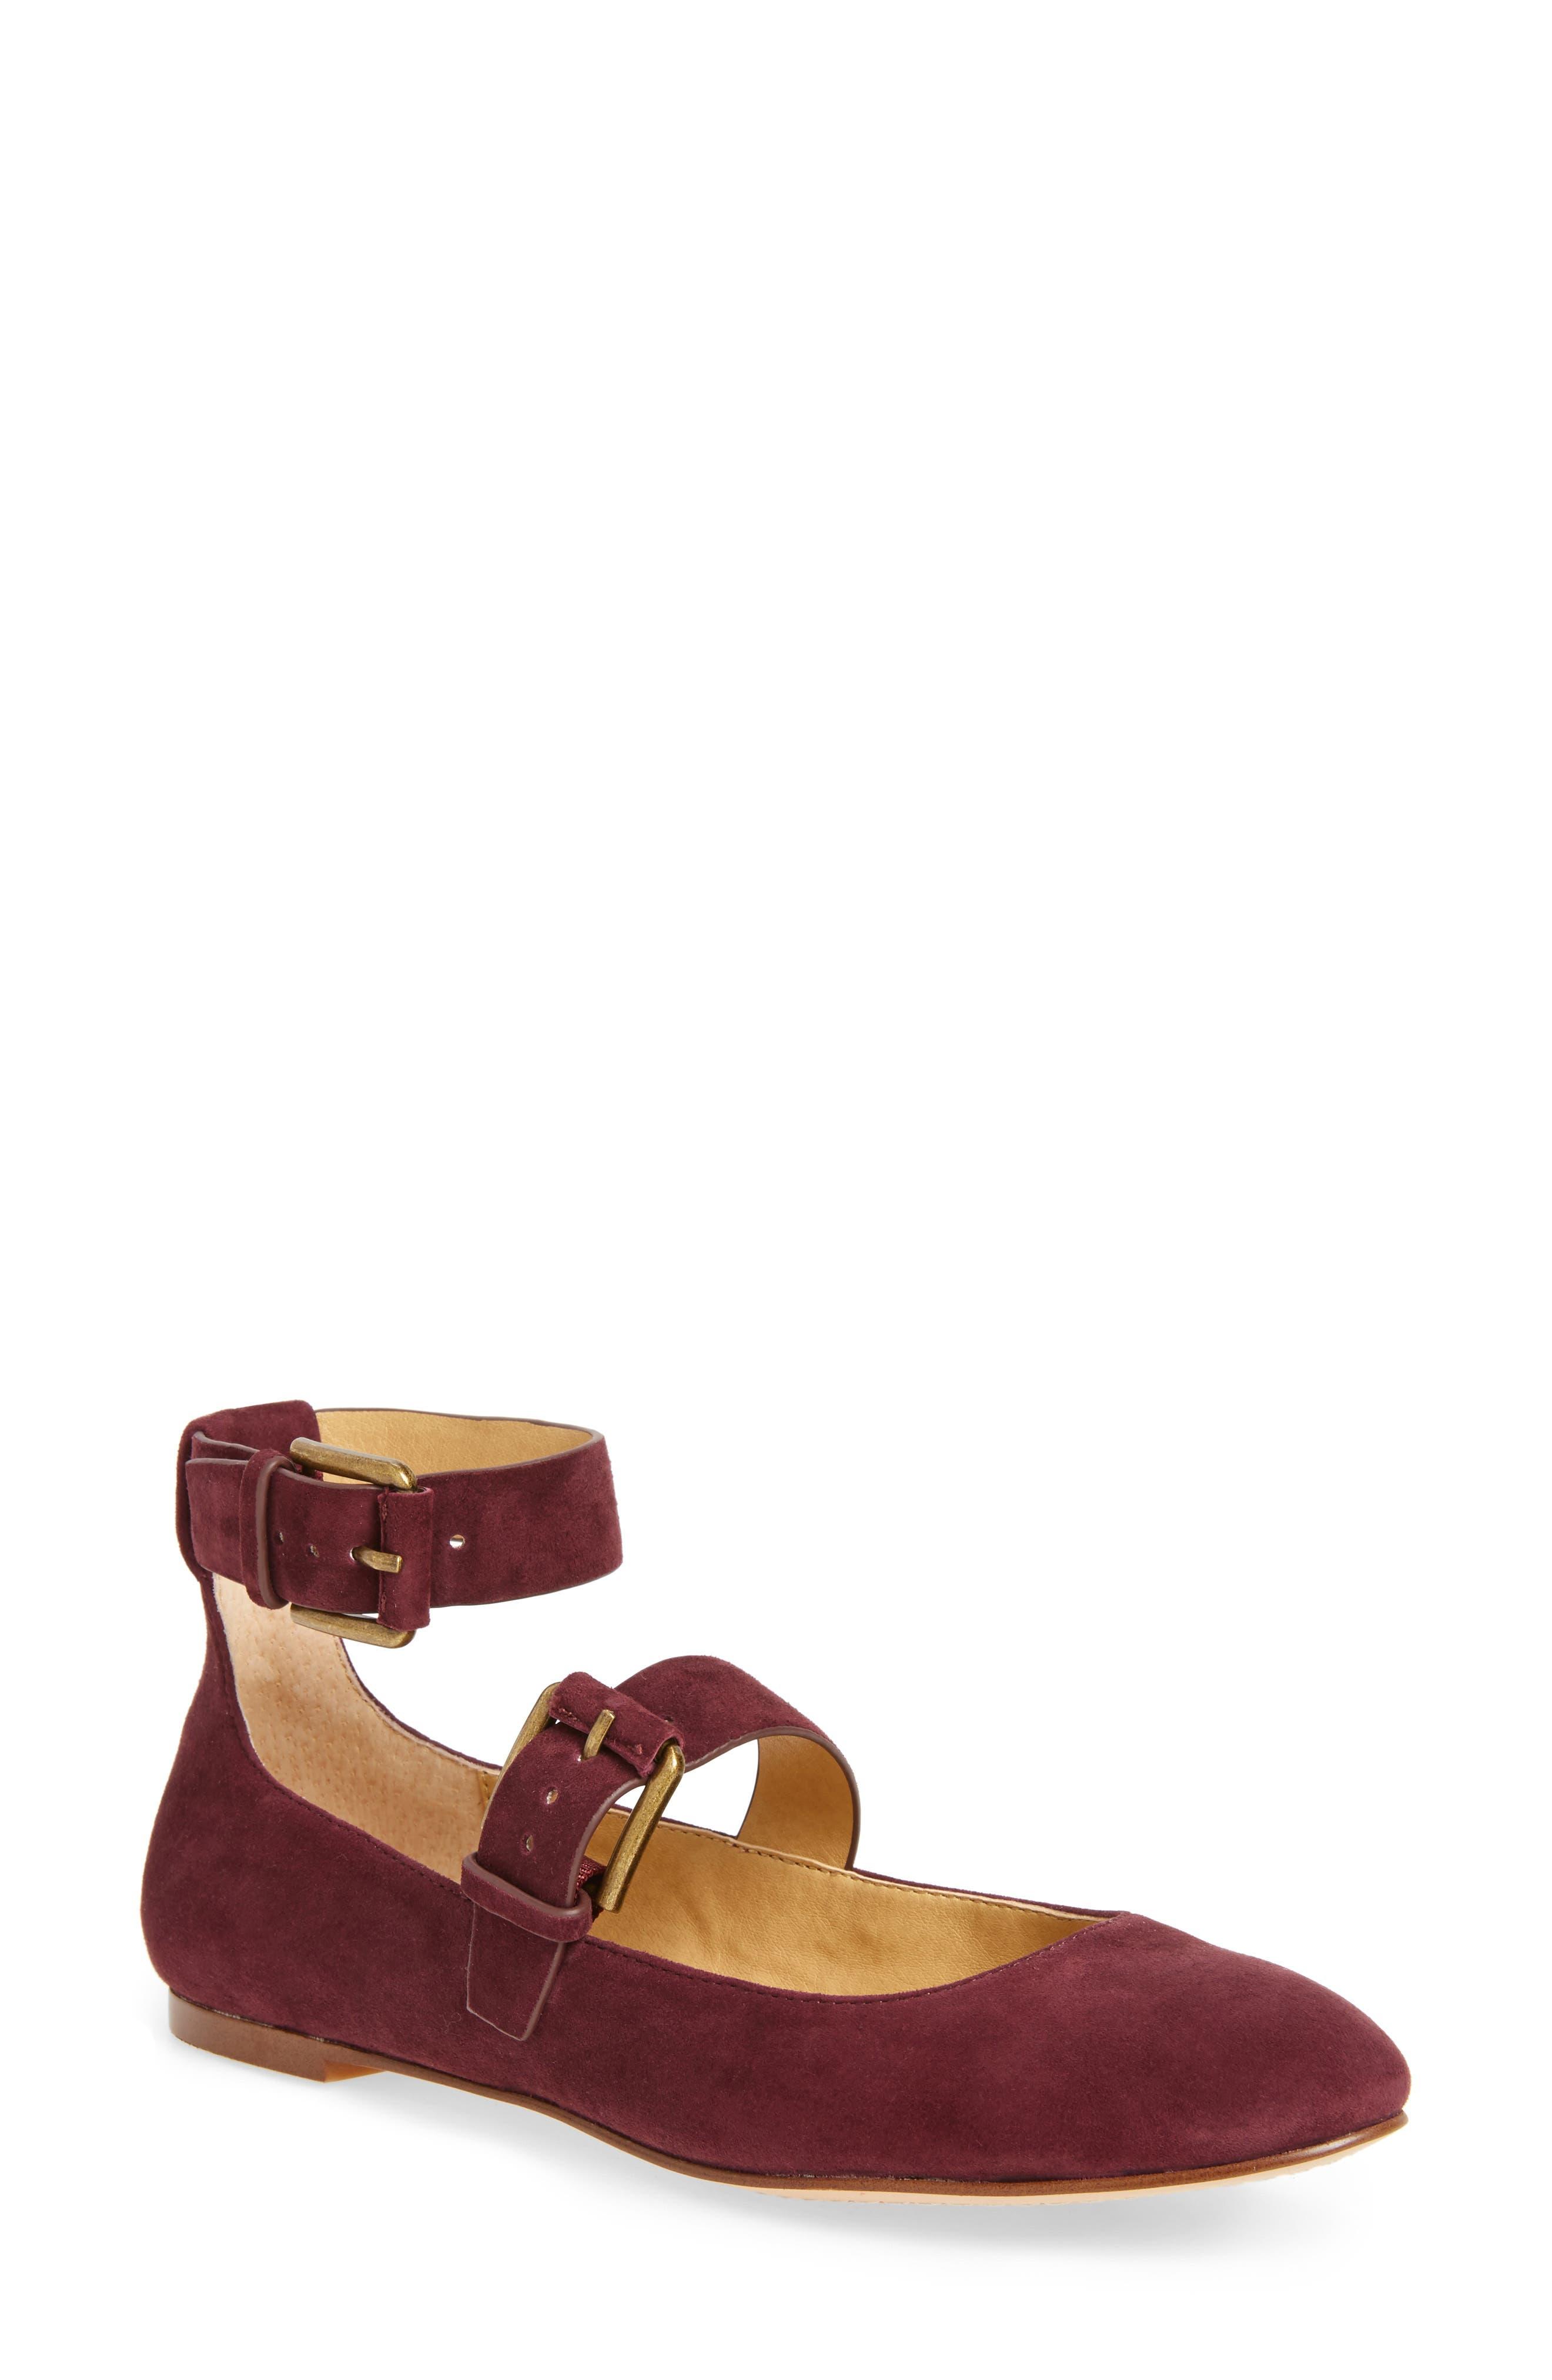 Dalenna Ankle Strap Ballet Flat,                         Main,                         color, Wine Suede